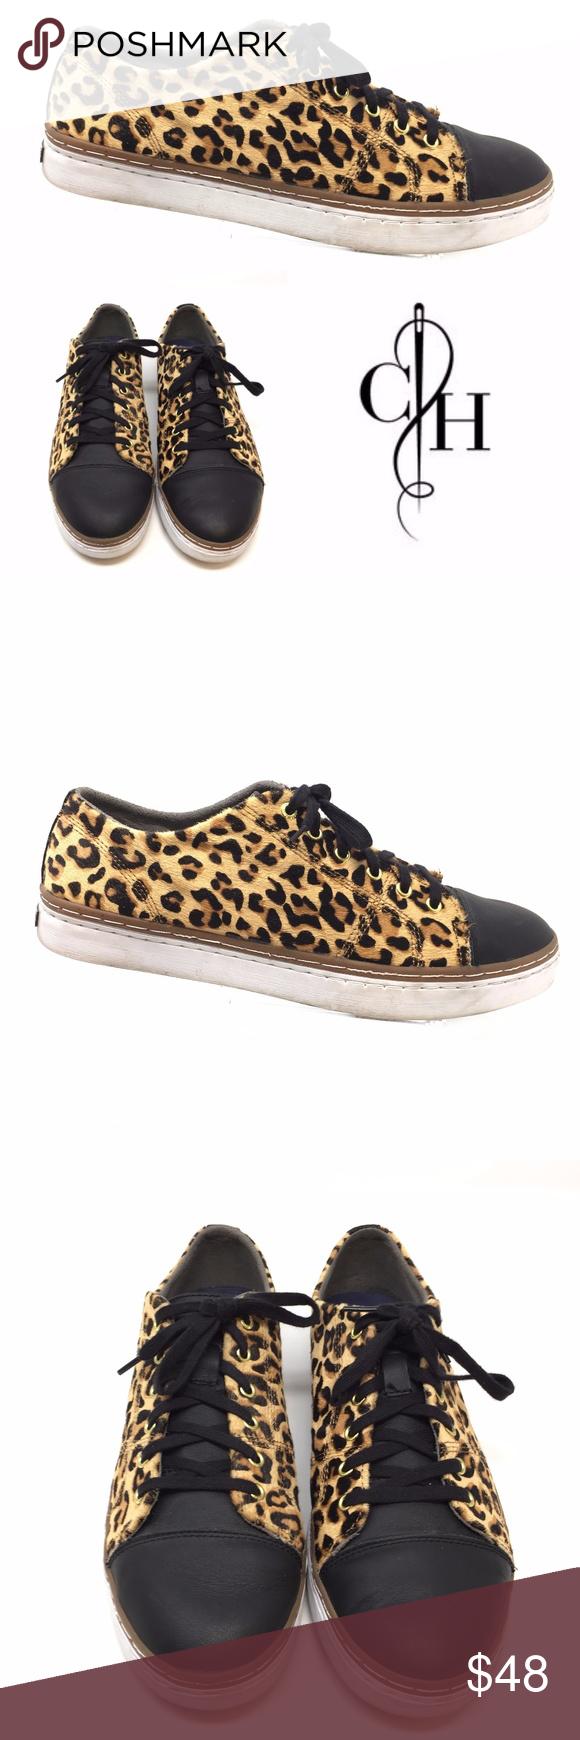 Leopard print sneakers, Cole haan shoes